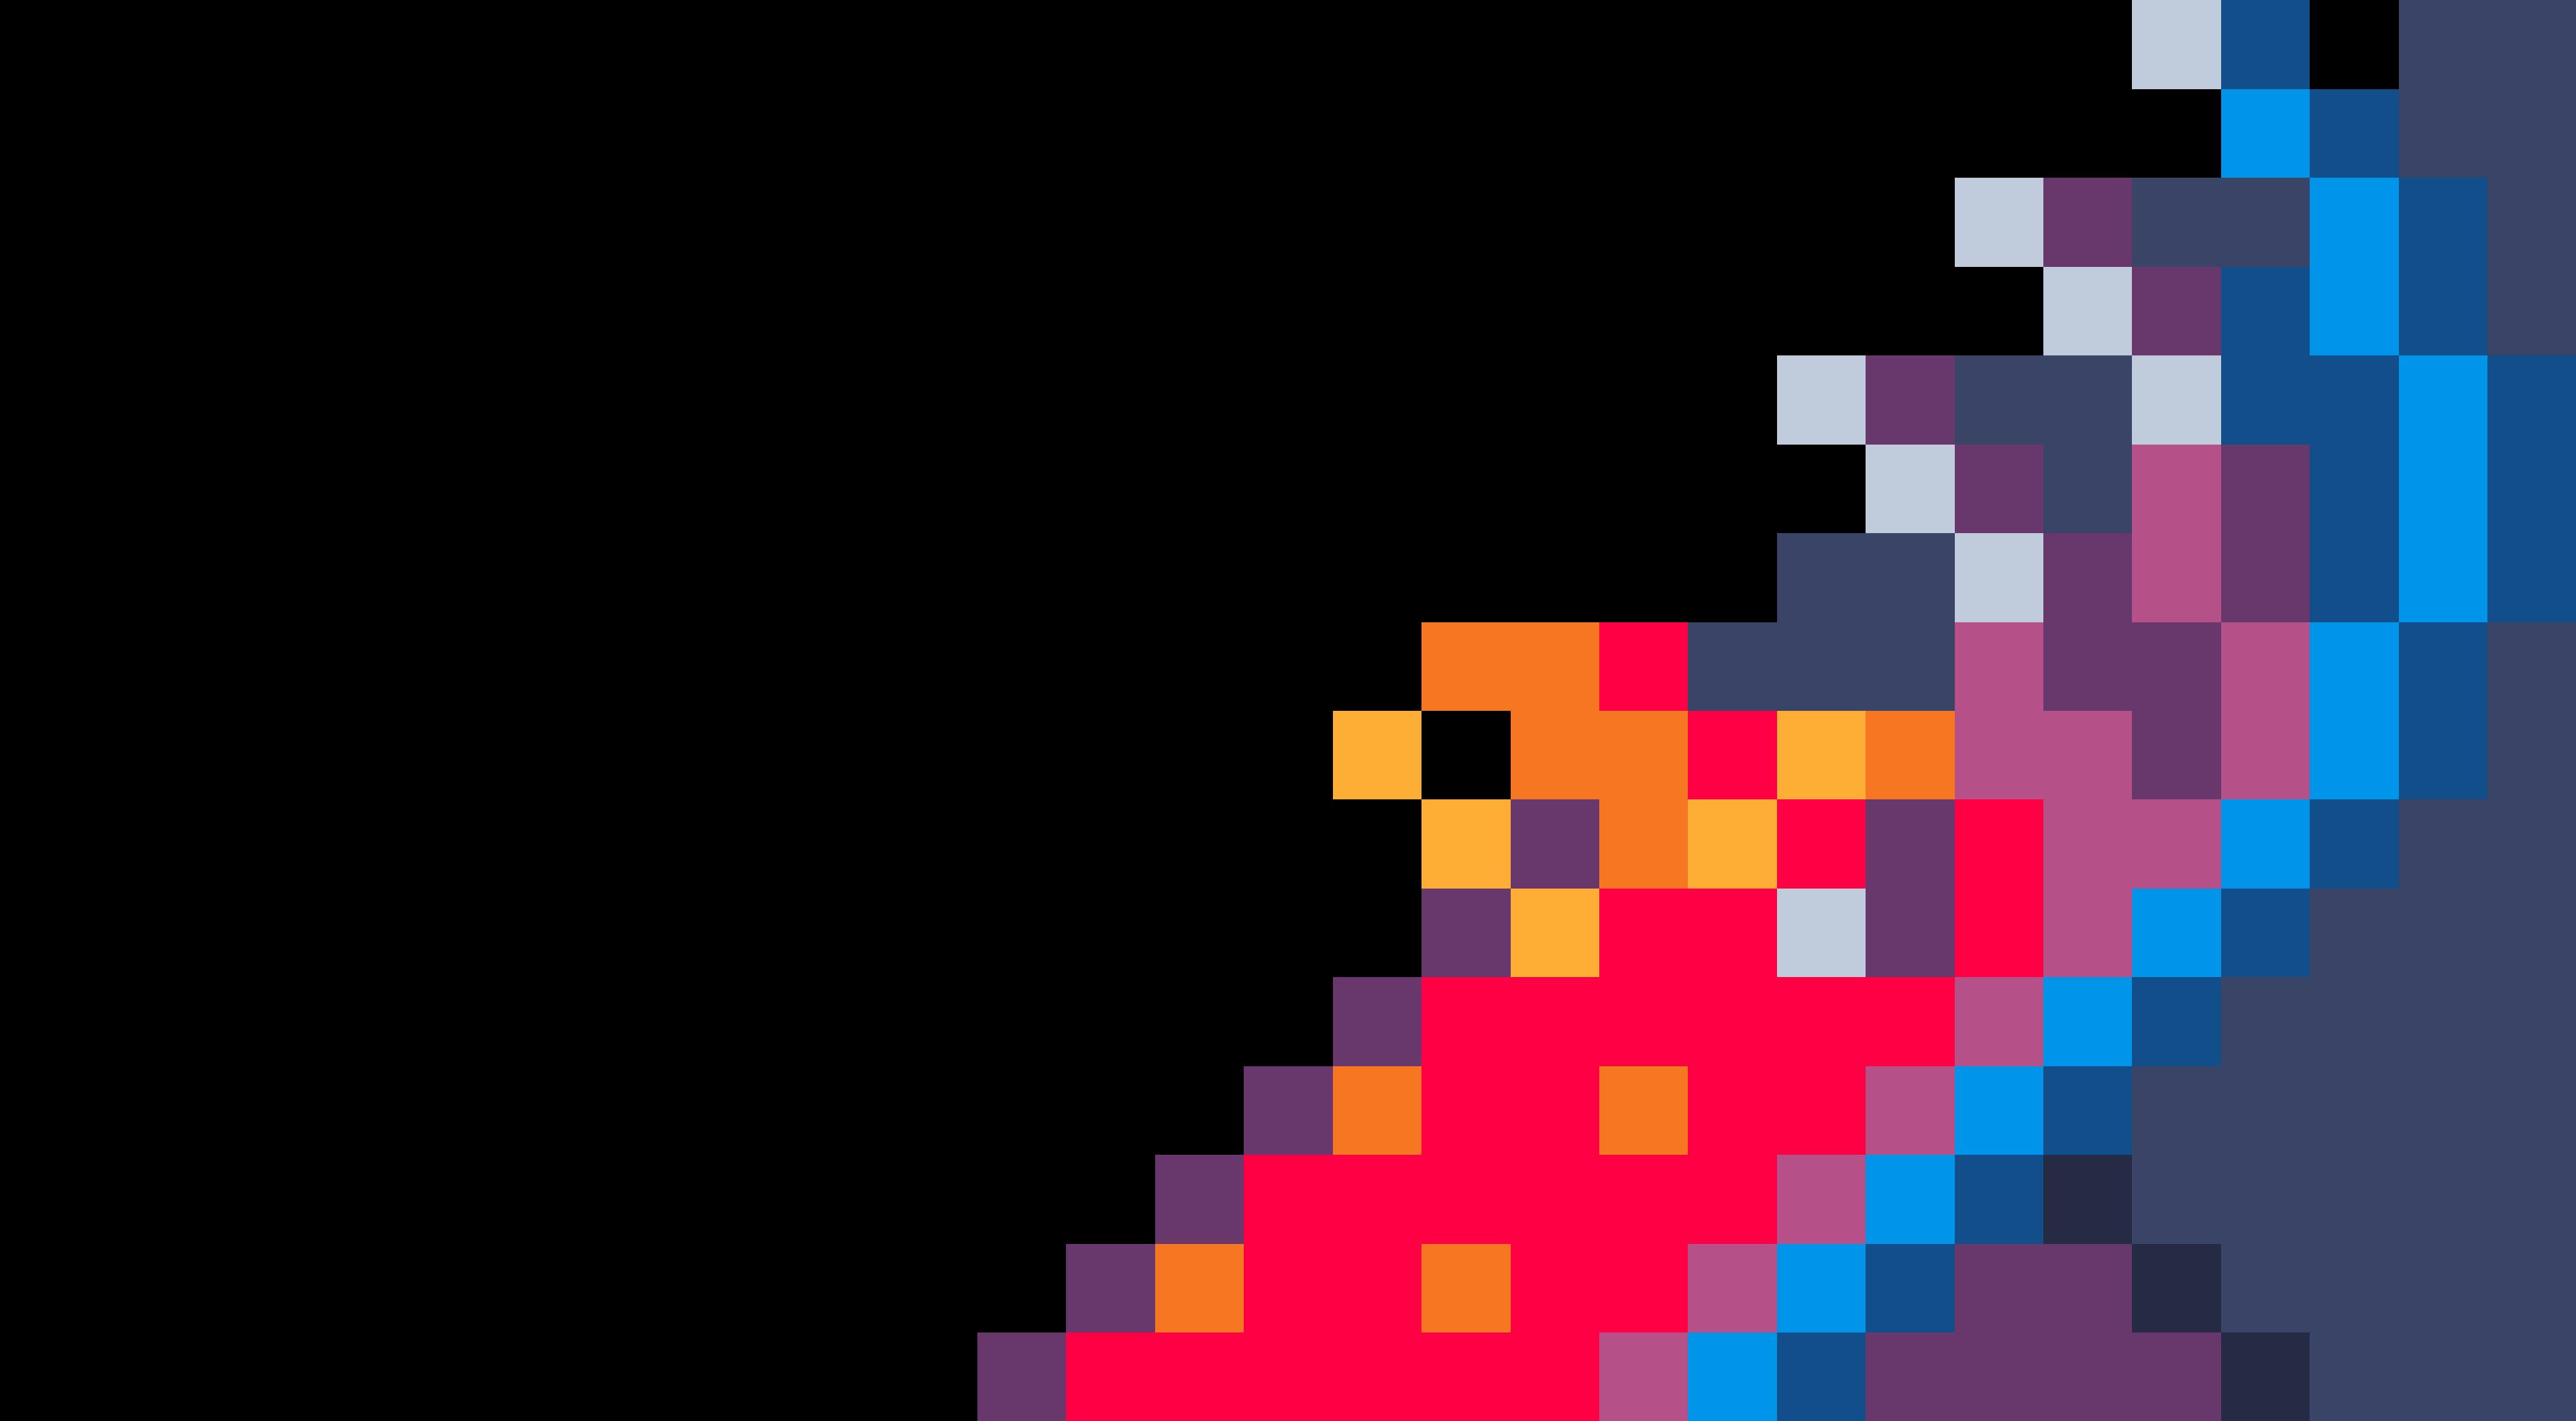 Build 8 Bit By Microsoft Wallpapers Wallpaperhub